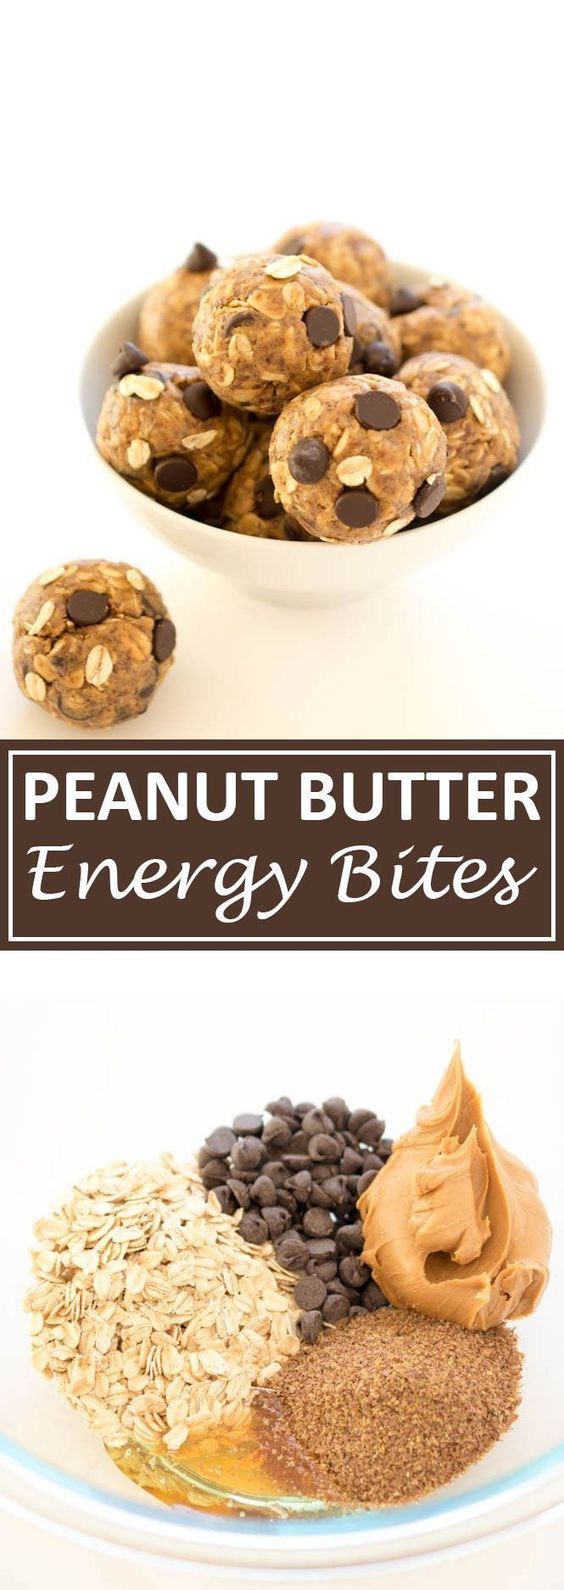 5 Ingredient Peanut Butter Energy Bites #peanut #butter #energybites #healthyrecipes #healthysnack